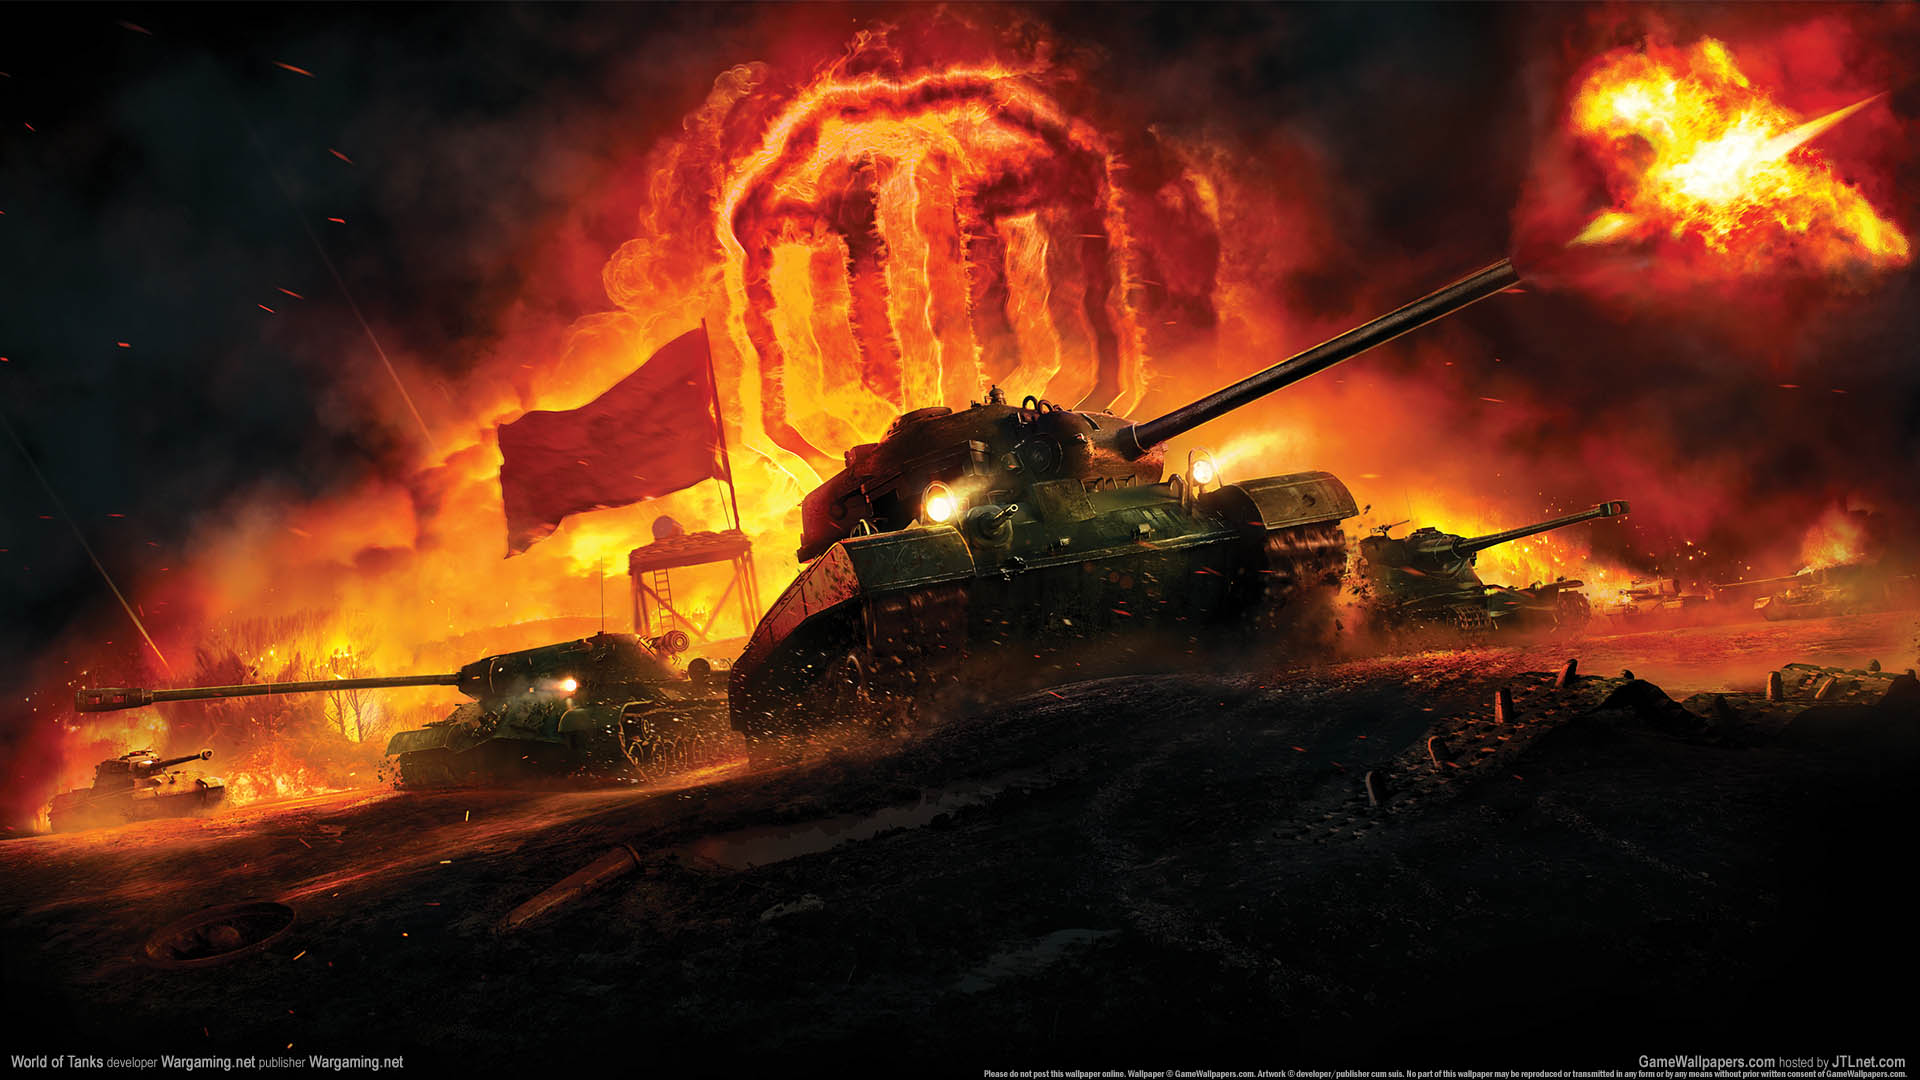 World of Tanks wallpaper 06 1920x1080